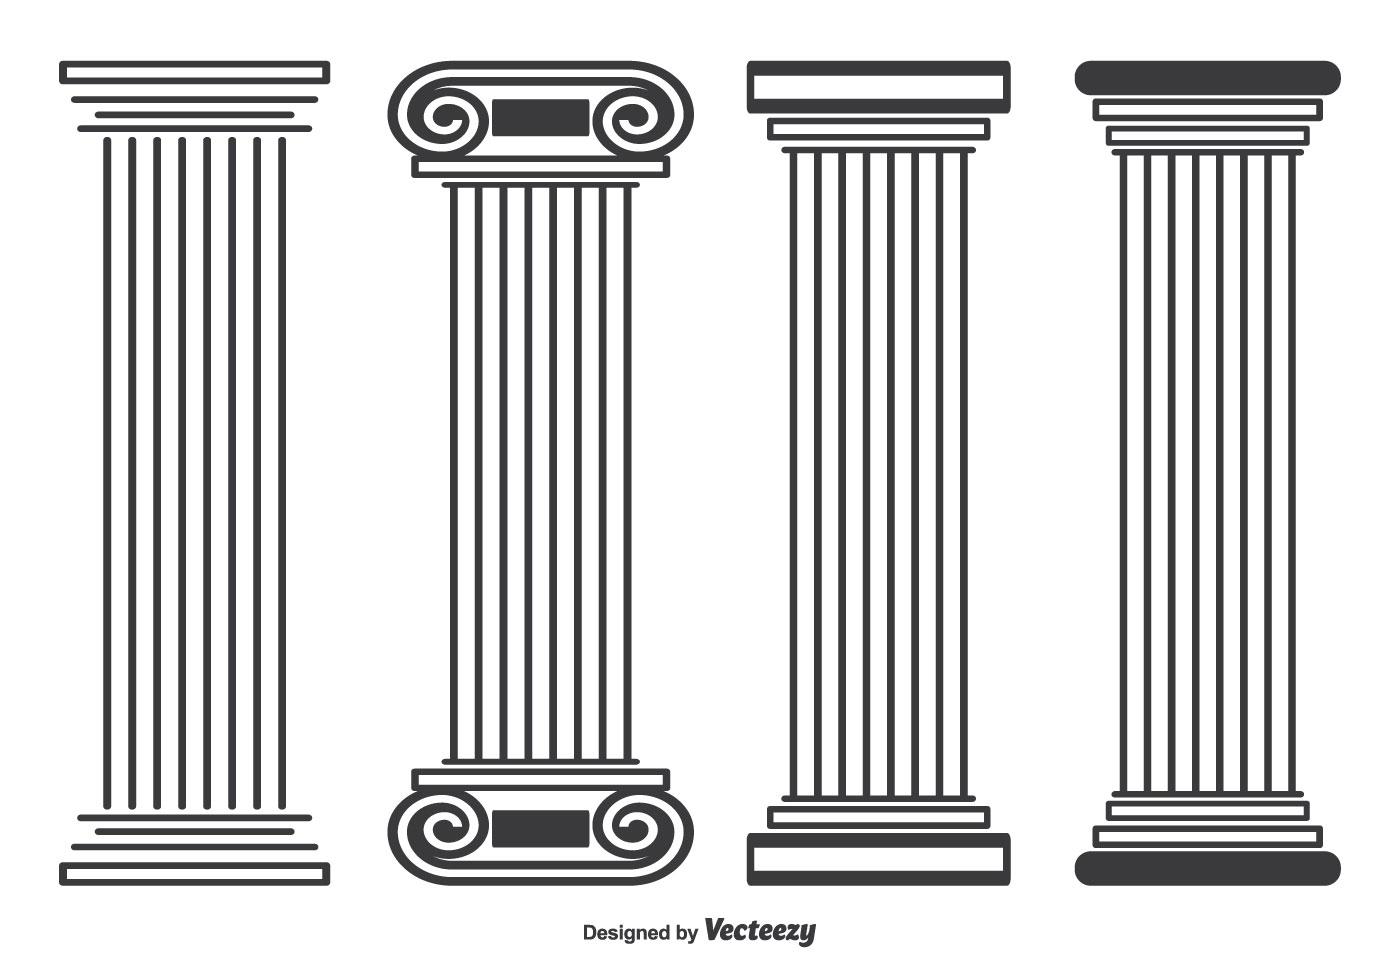 Roman Stayle Pillar Vector Shapes - Download Free Vector Art, Stock ...